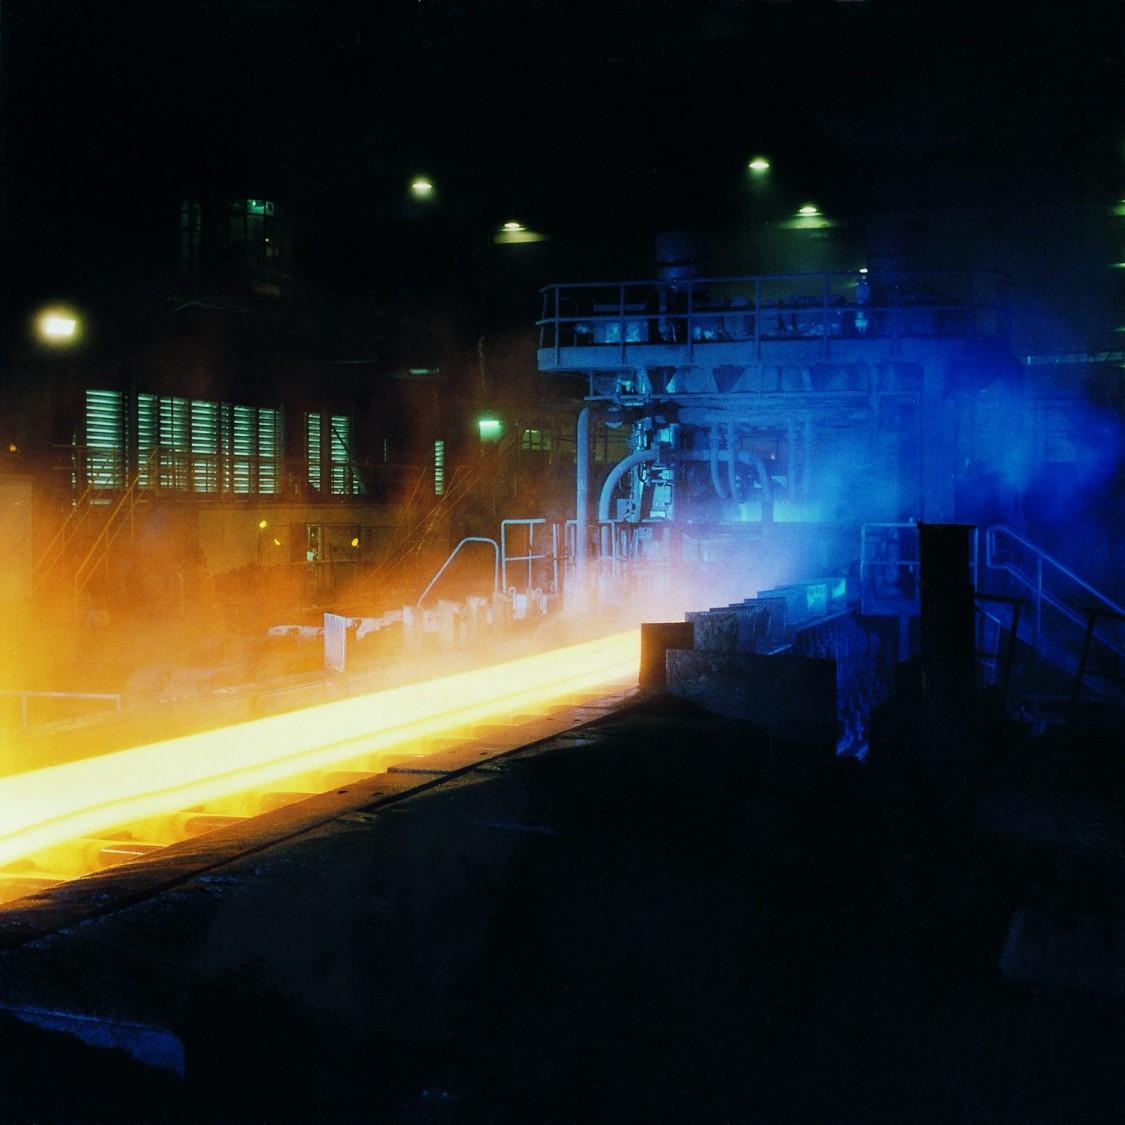 Roller conveyor in steel industry